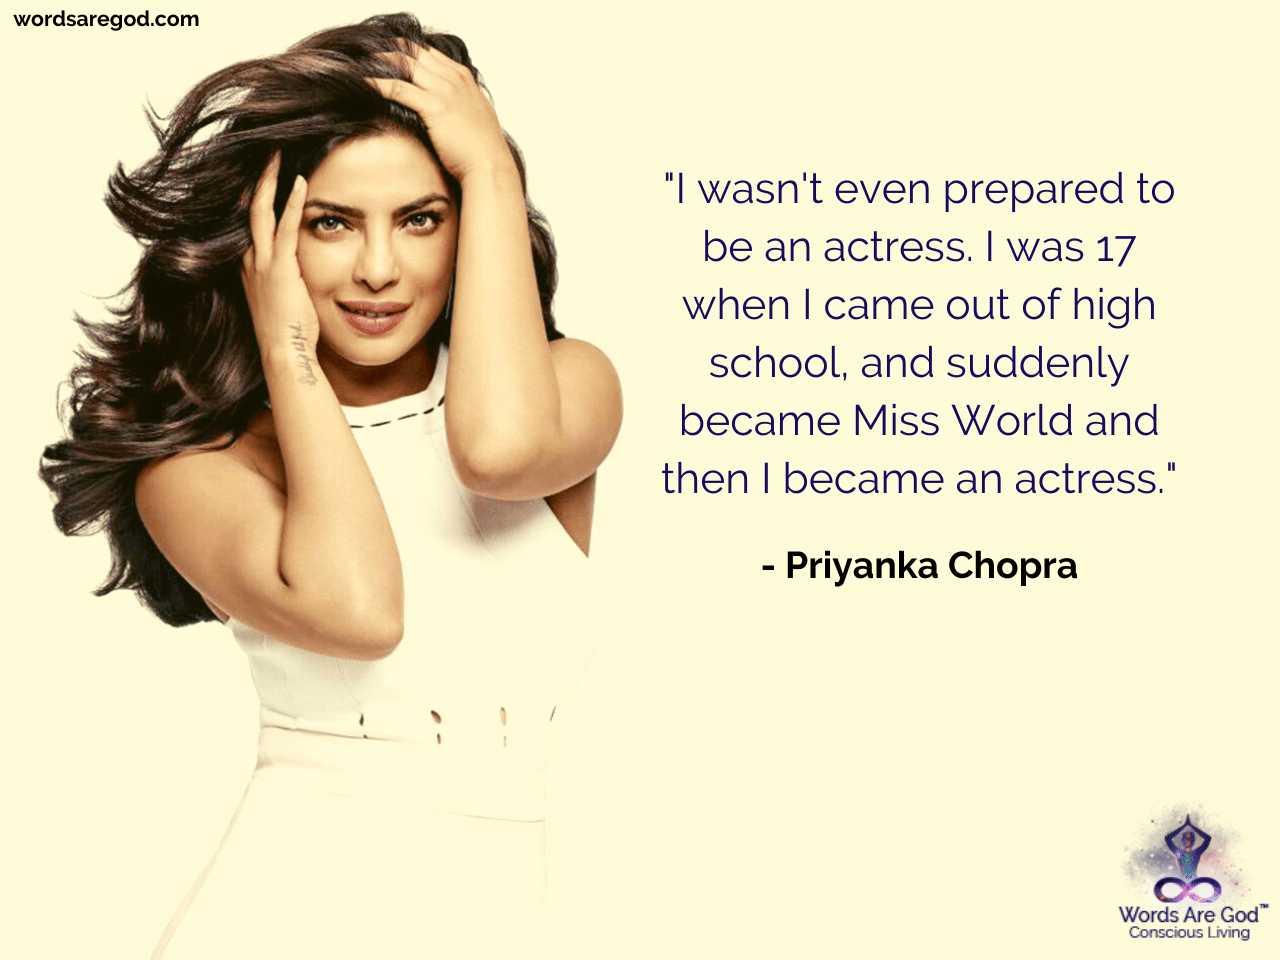 Priyanka Chopra Motivational Quote